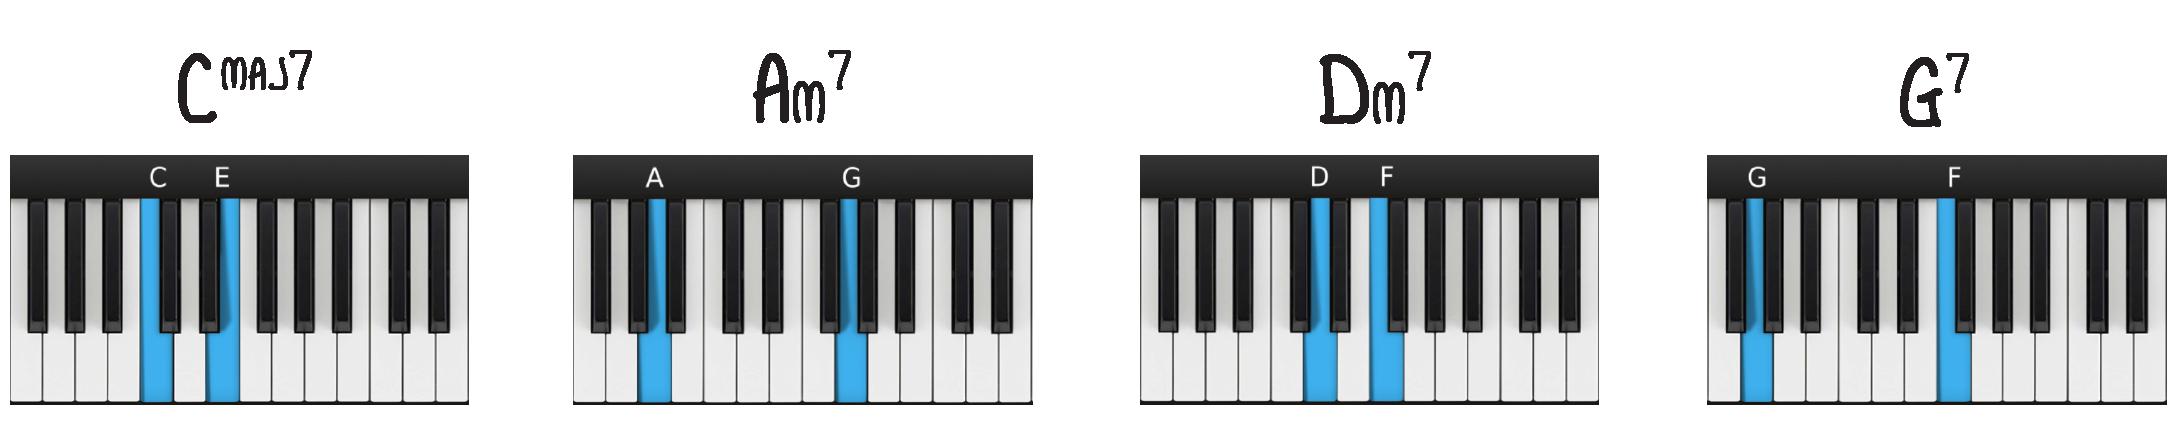 Beginner jazz piano left hand chord shells: 1-6-2-5